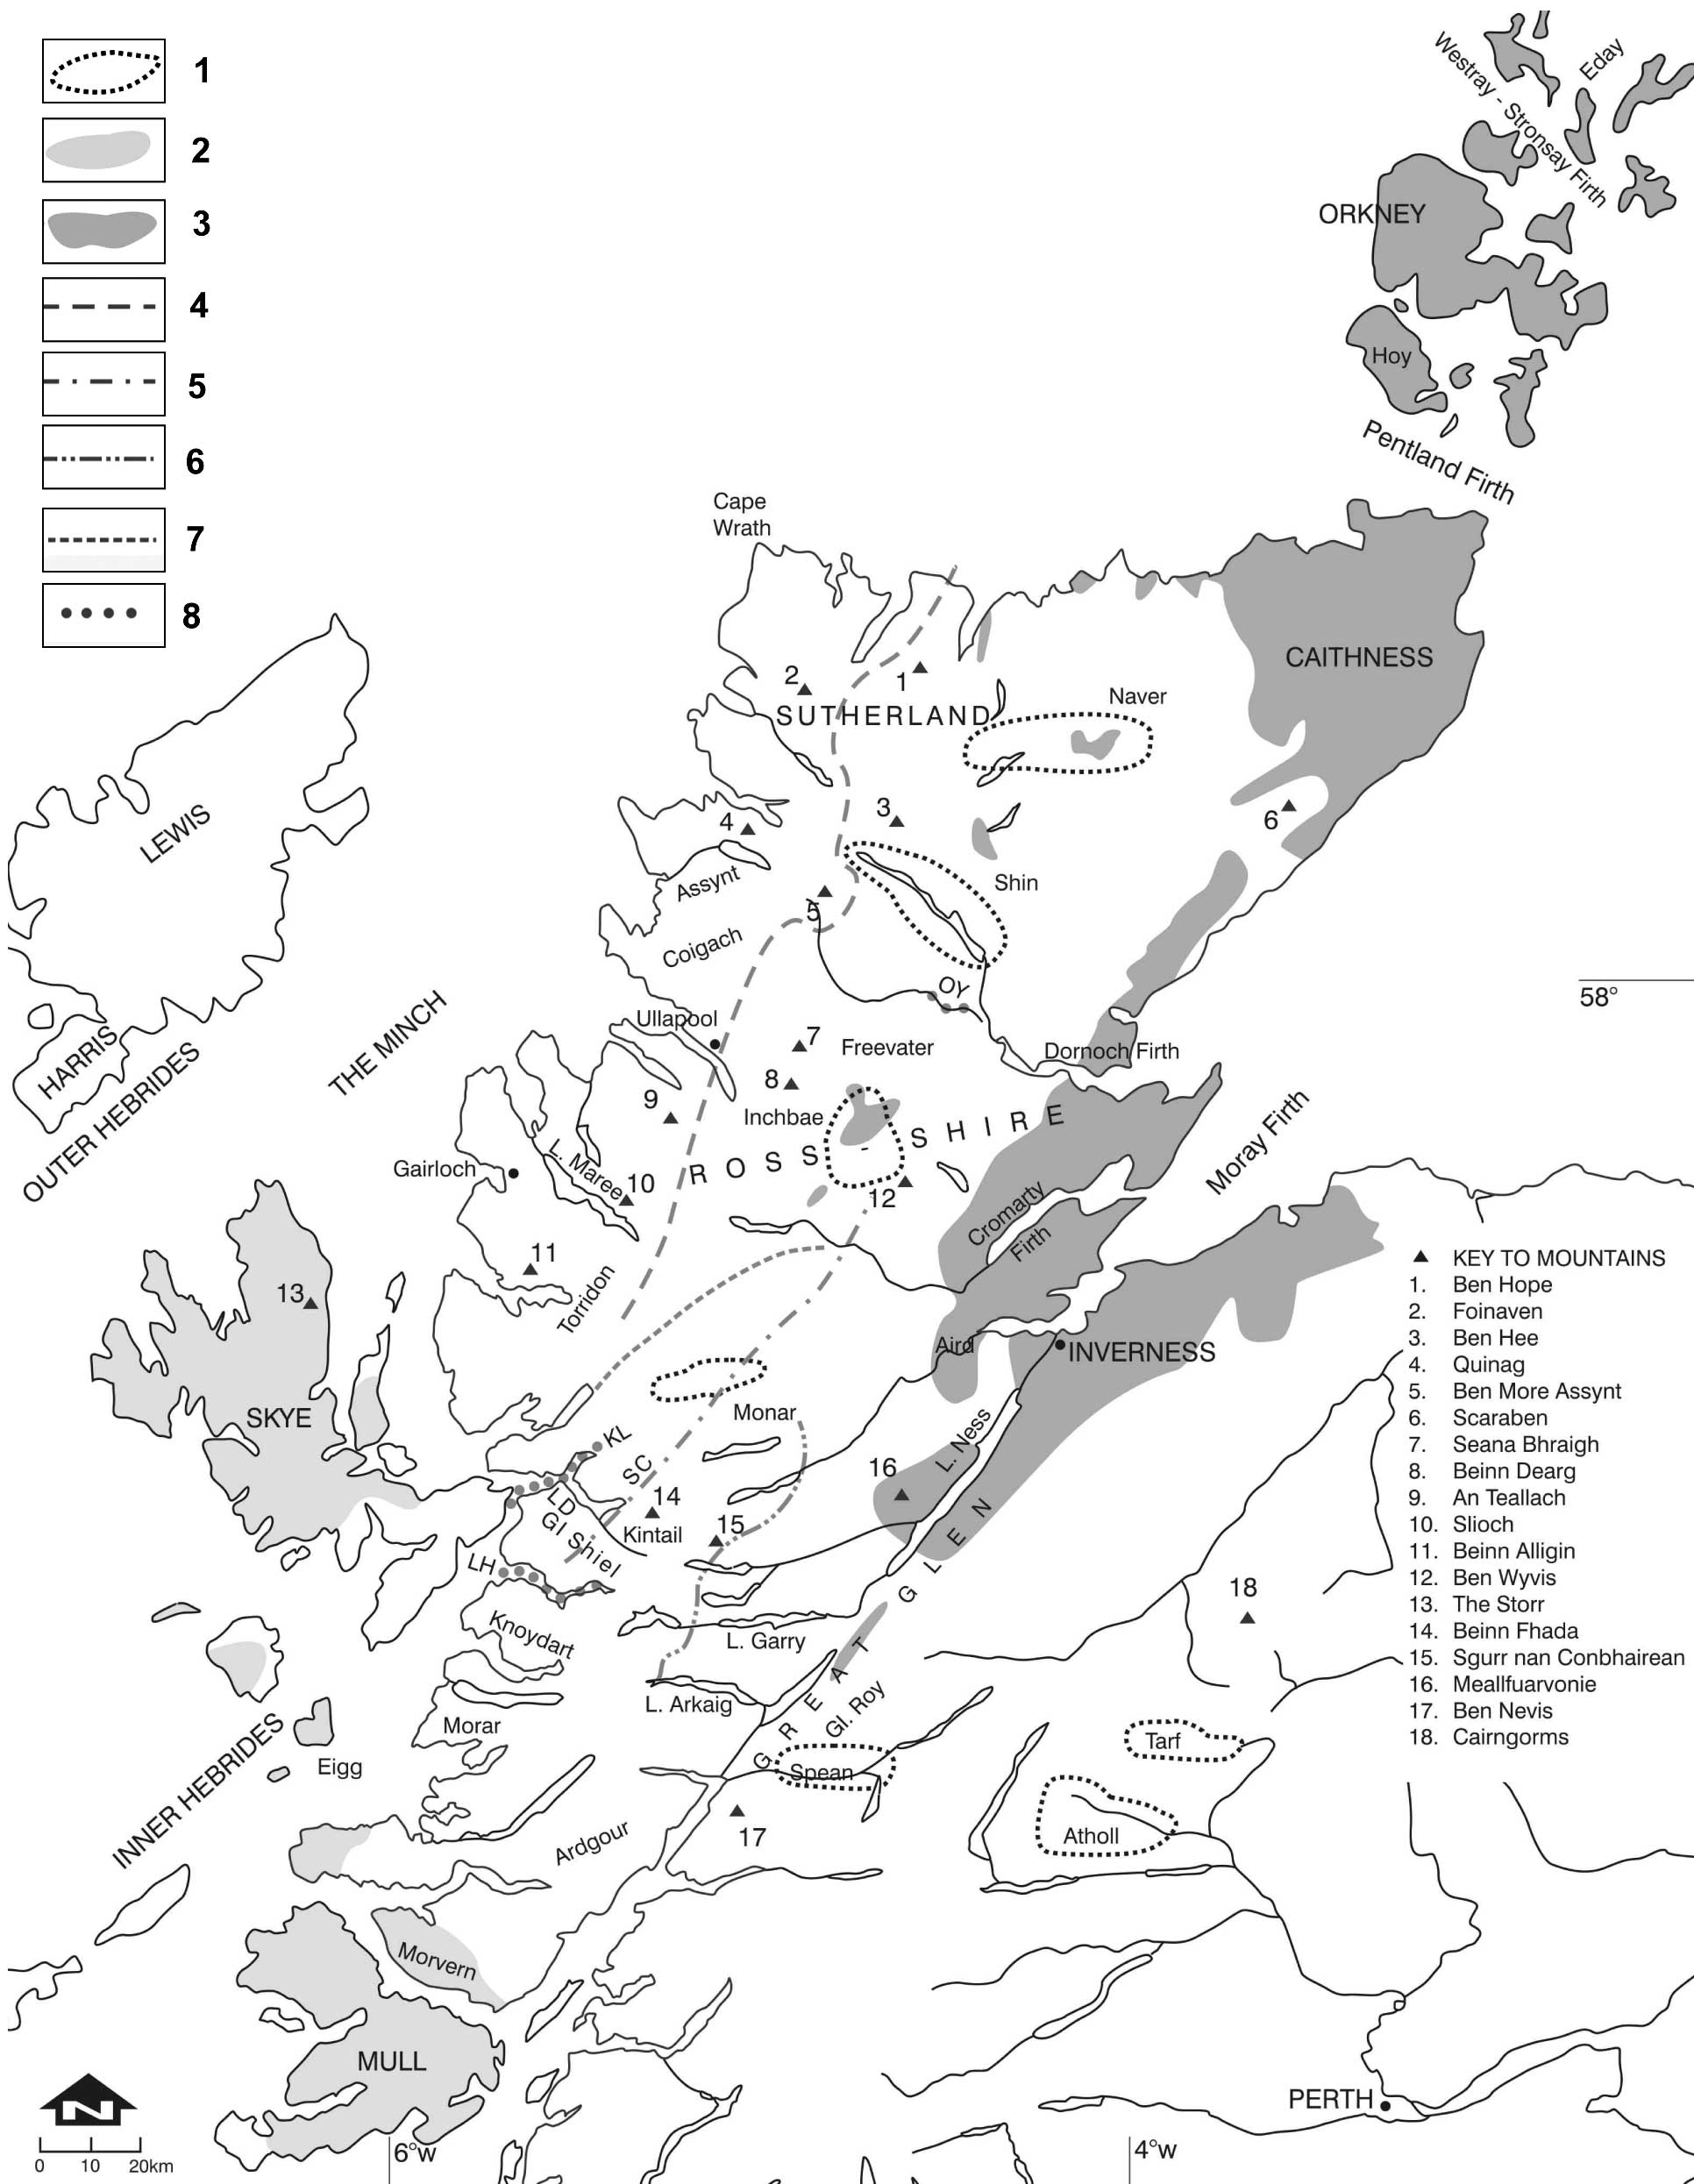 alain godard on the nw highlands of scotland present relevance for  agrandir